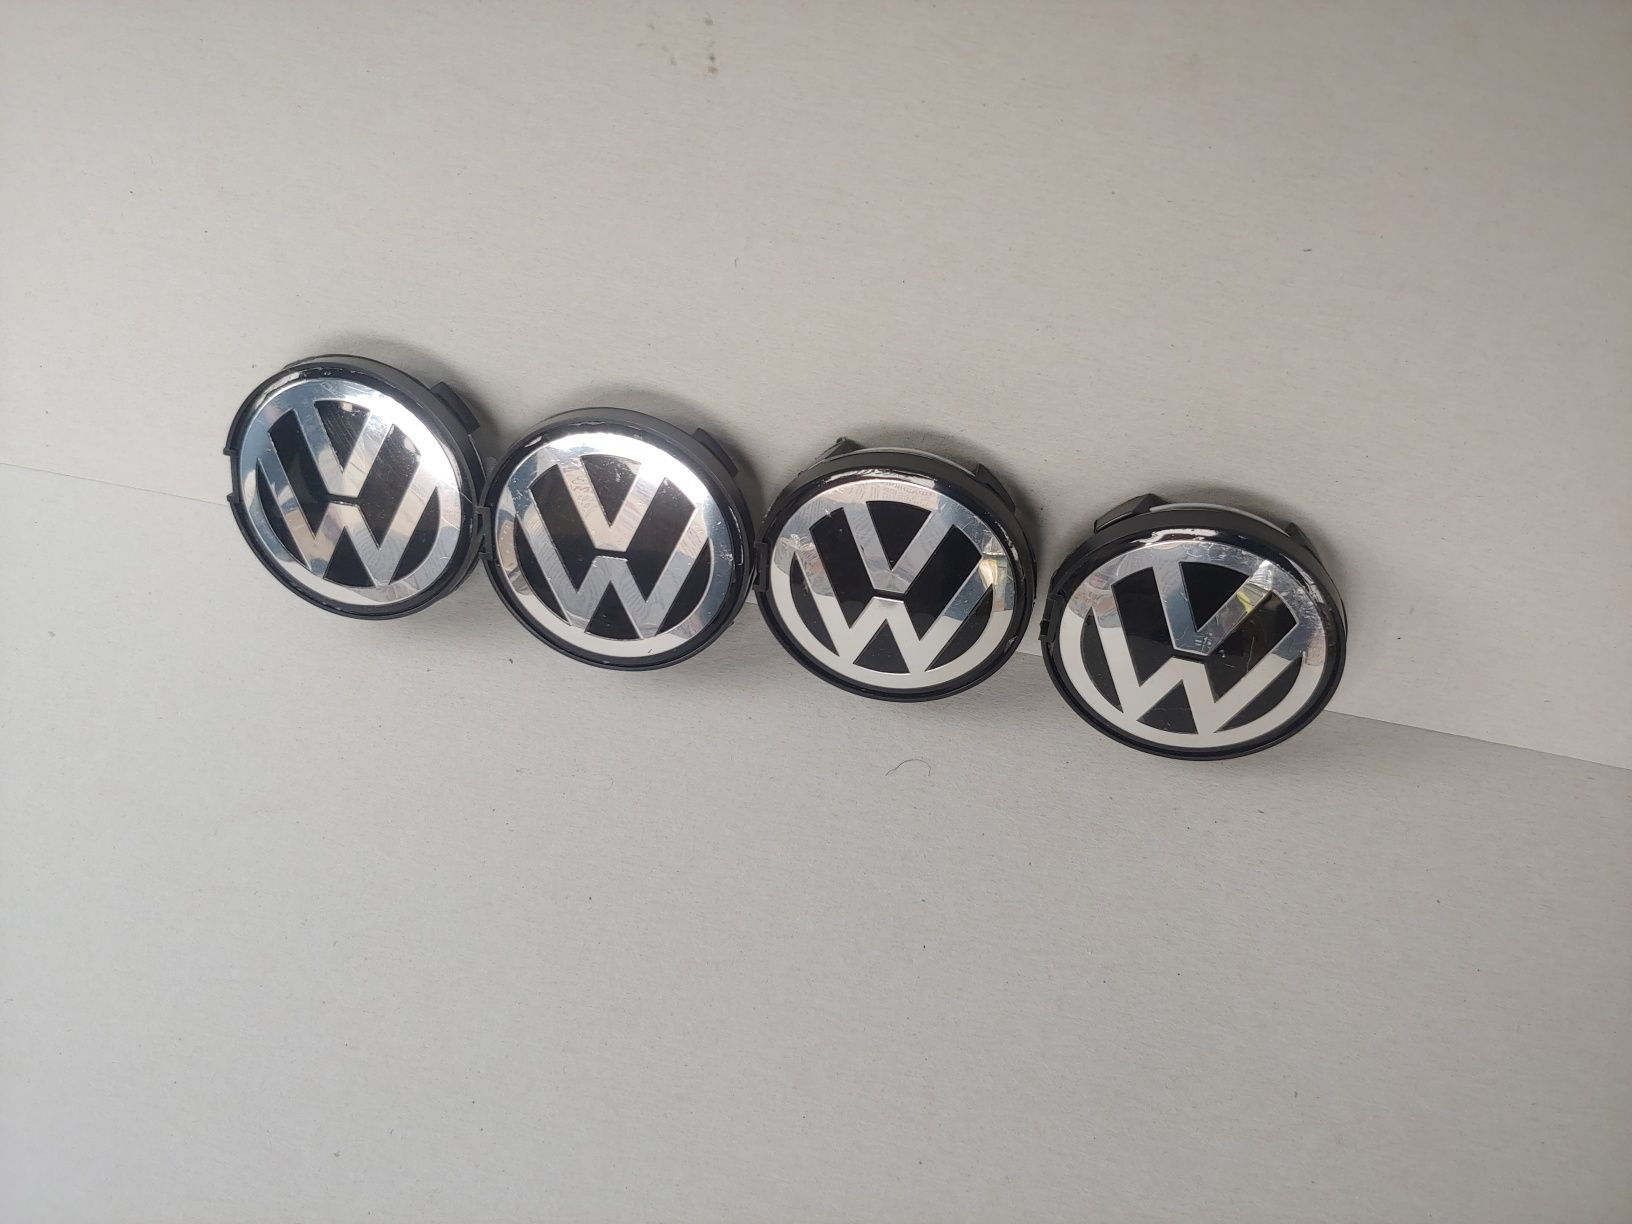 63мм Капачки за джанти Фолксваген VW Шаран Пасат 5 OEM 7D0 601 165